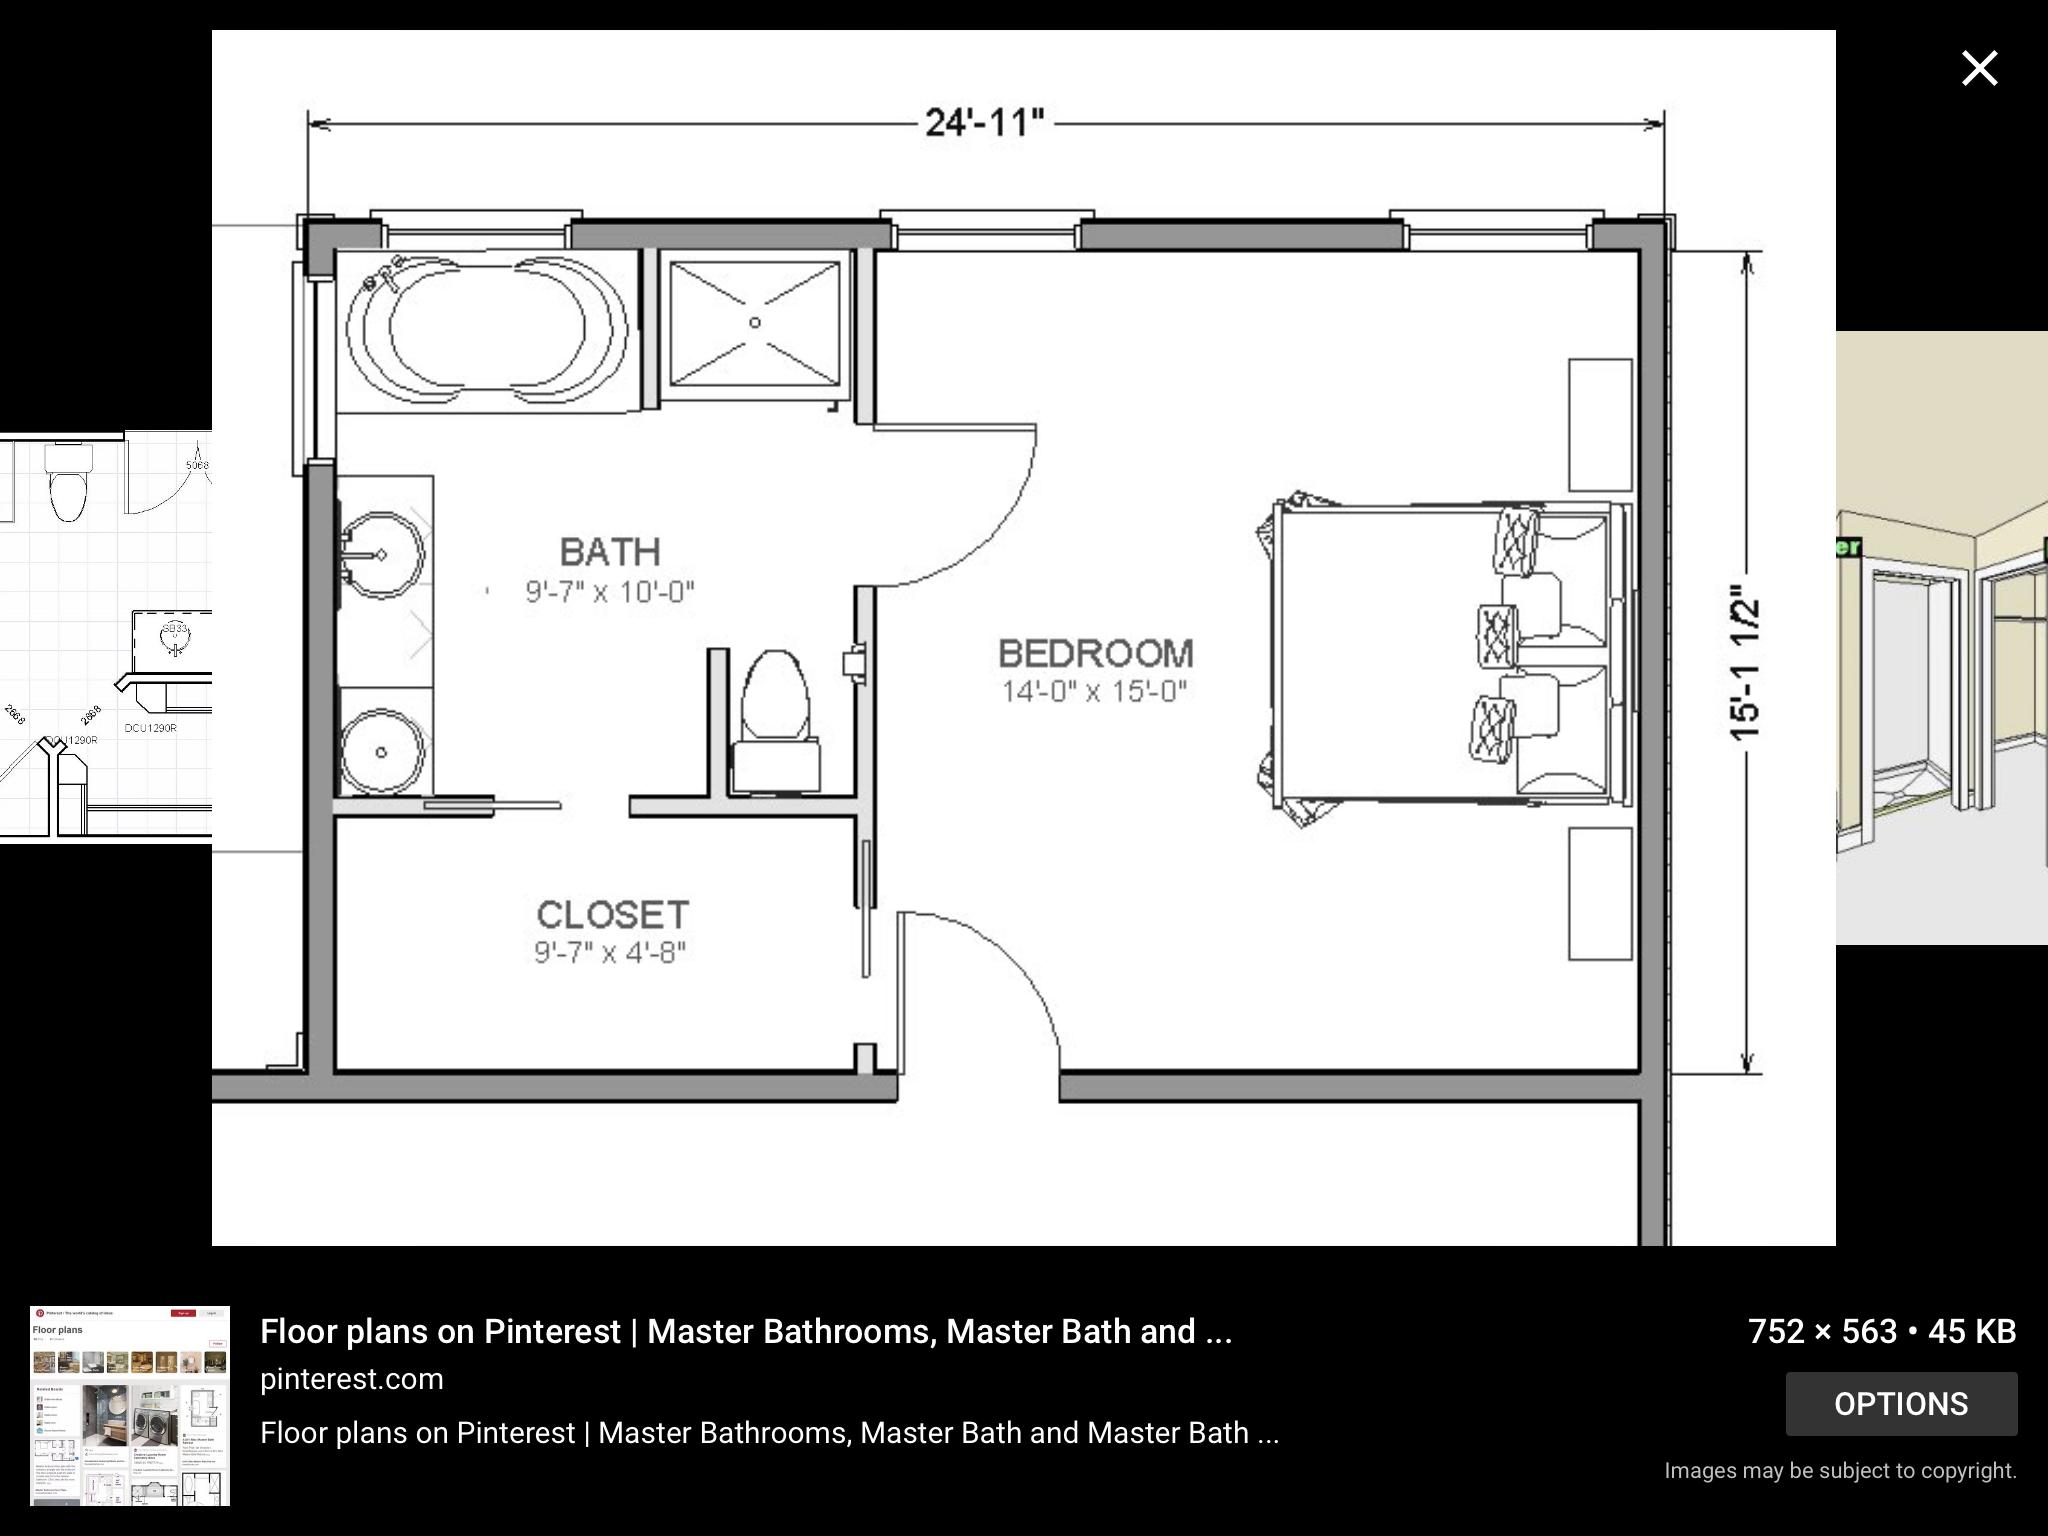 Pin By Carla Baker On House Flip Master Bedroom Plans Master Bedroom Addition Bedroom Floor Plans